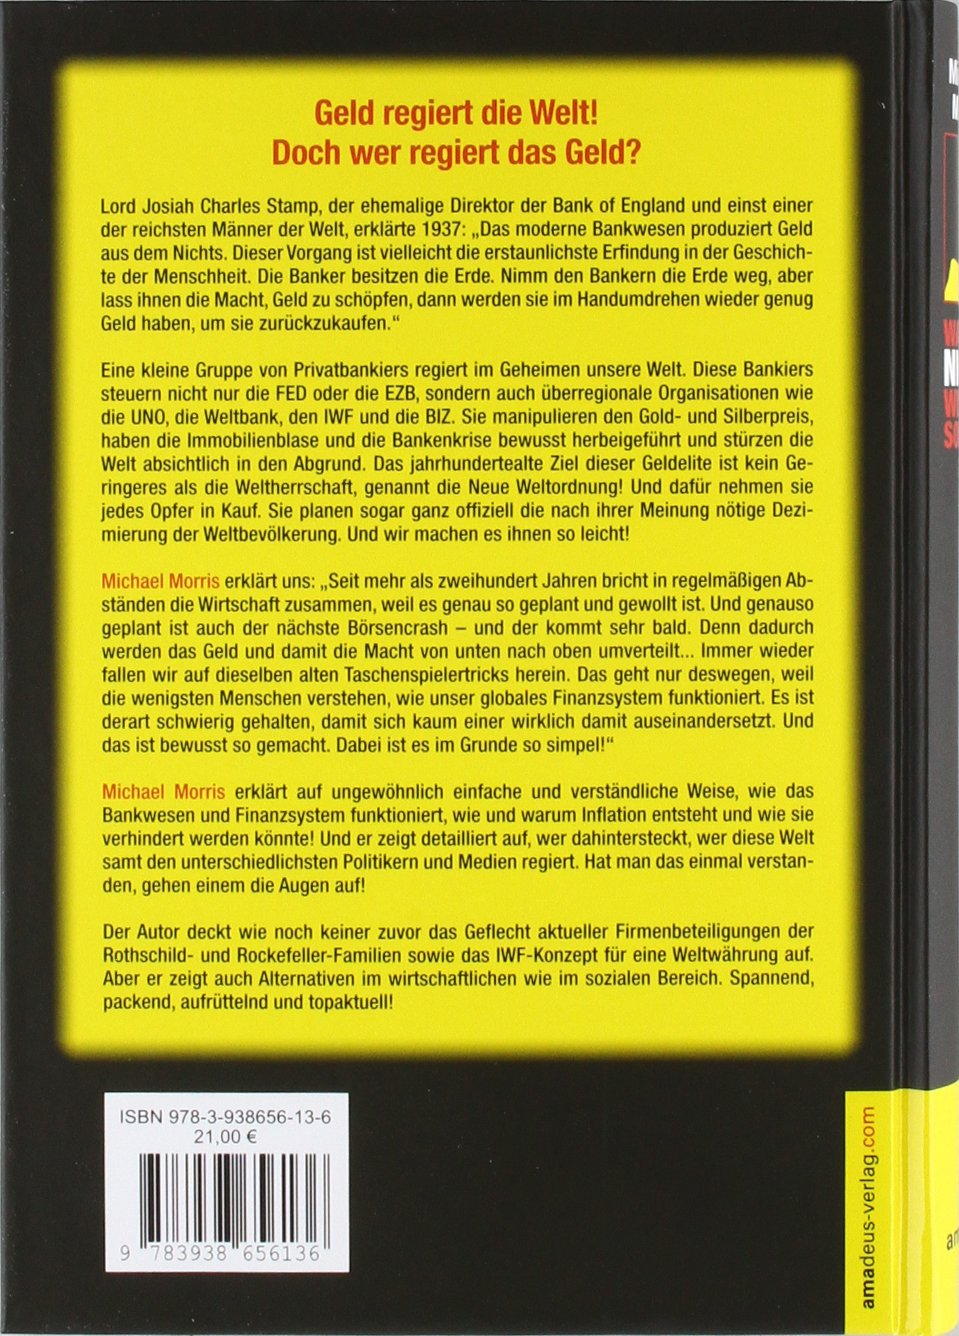 Michael Morris: 9783938656136: Amazon: Books